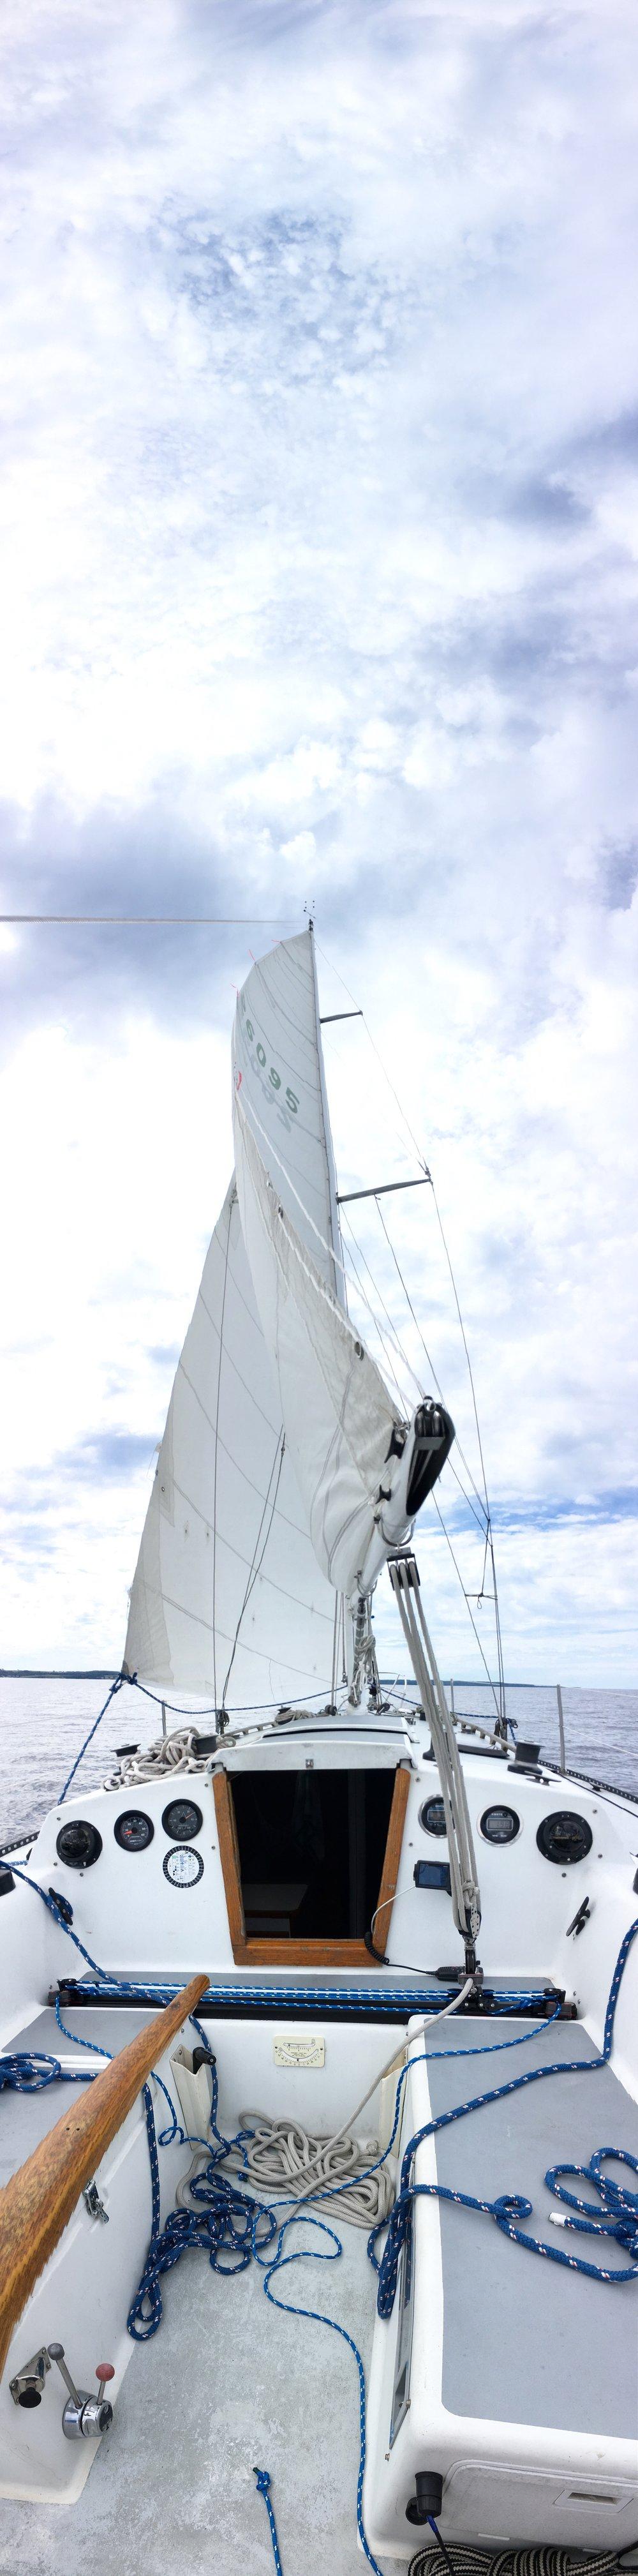 The sailing vessel Bernard. Photo by Todd Everett.